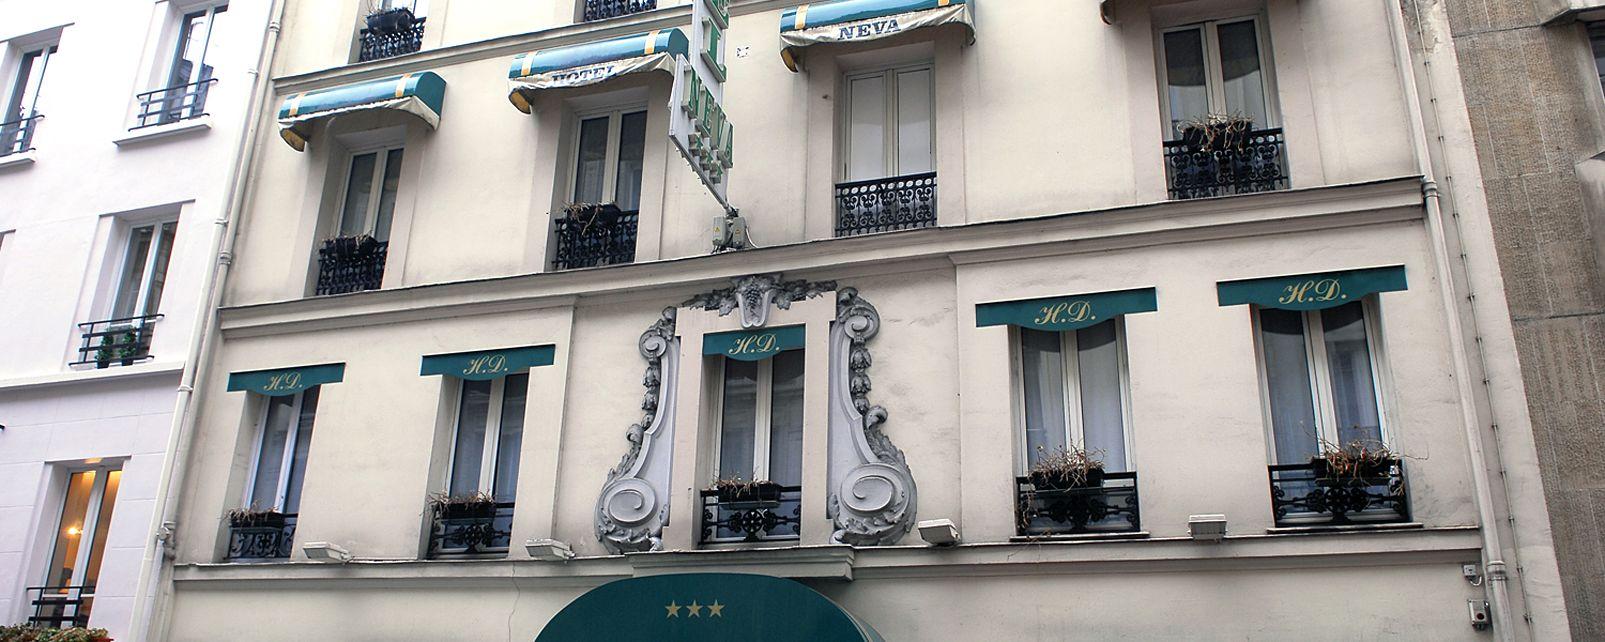 Hotel neva paris frankreich for Frankreich hotel paris